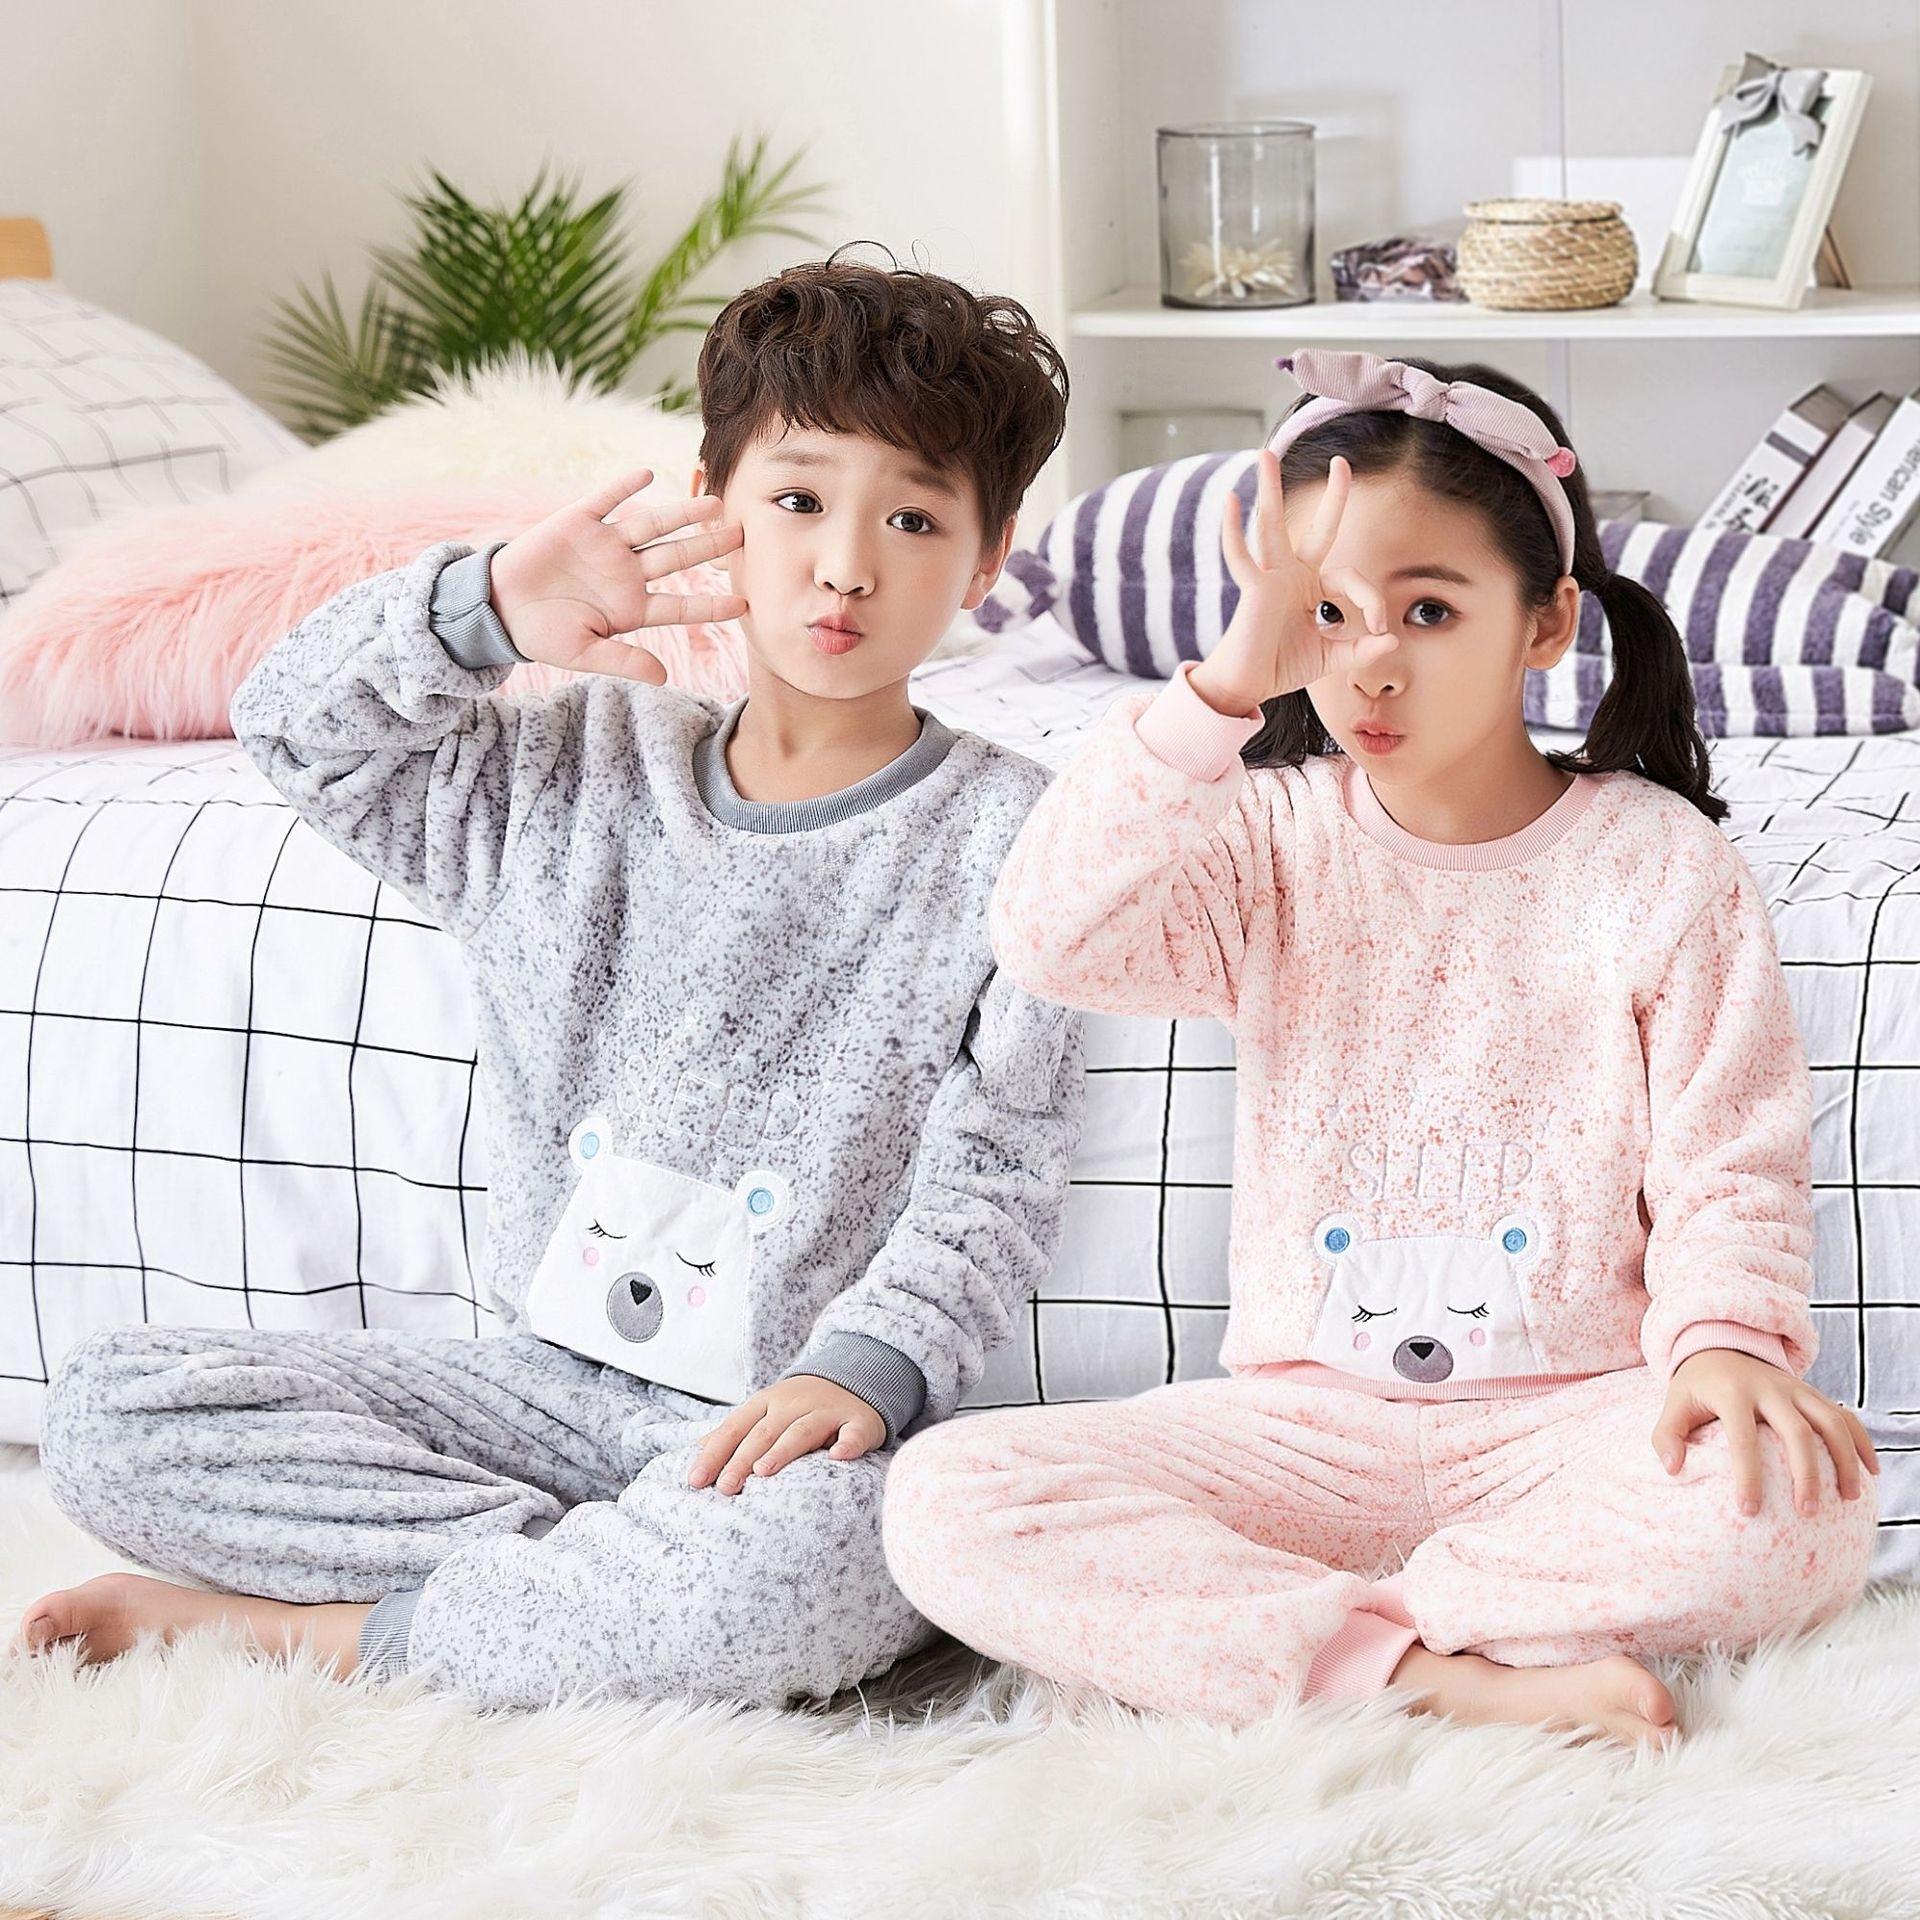 Silver Basic Unisex Baby Boys and Girls Fleece Flannel Novelty Pajamas Winter Warm Bath Robes